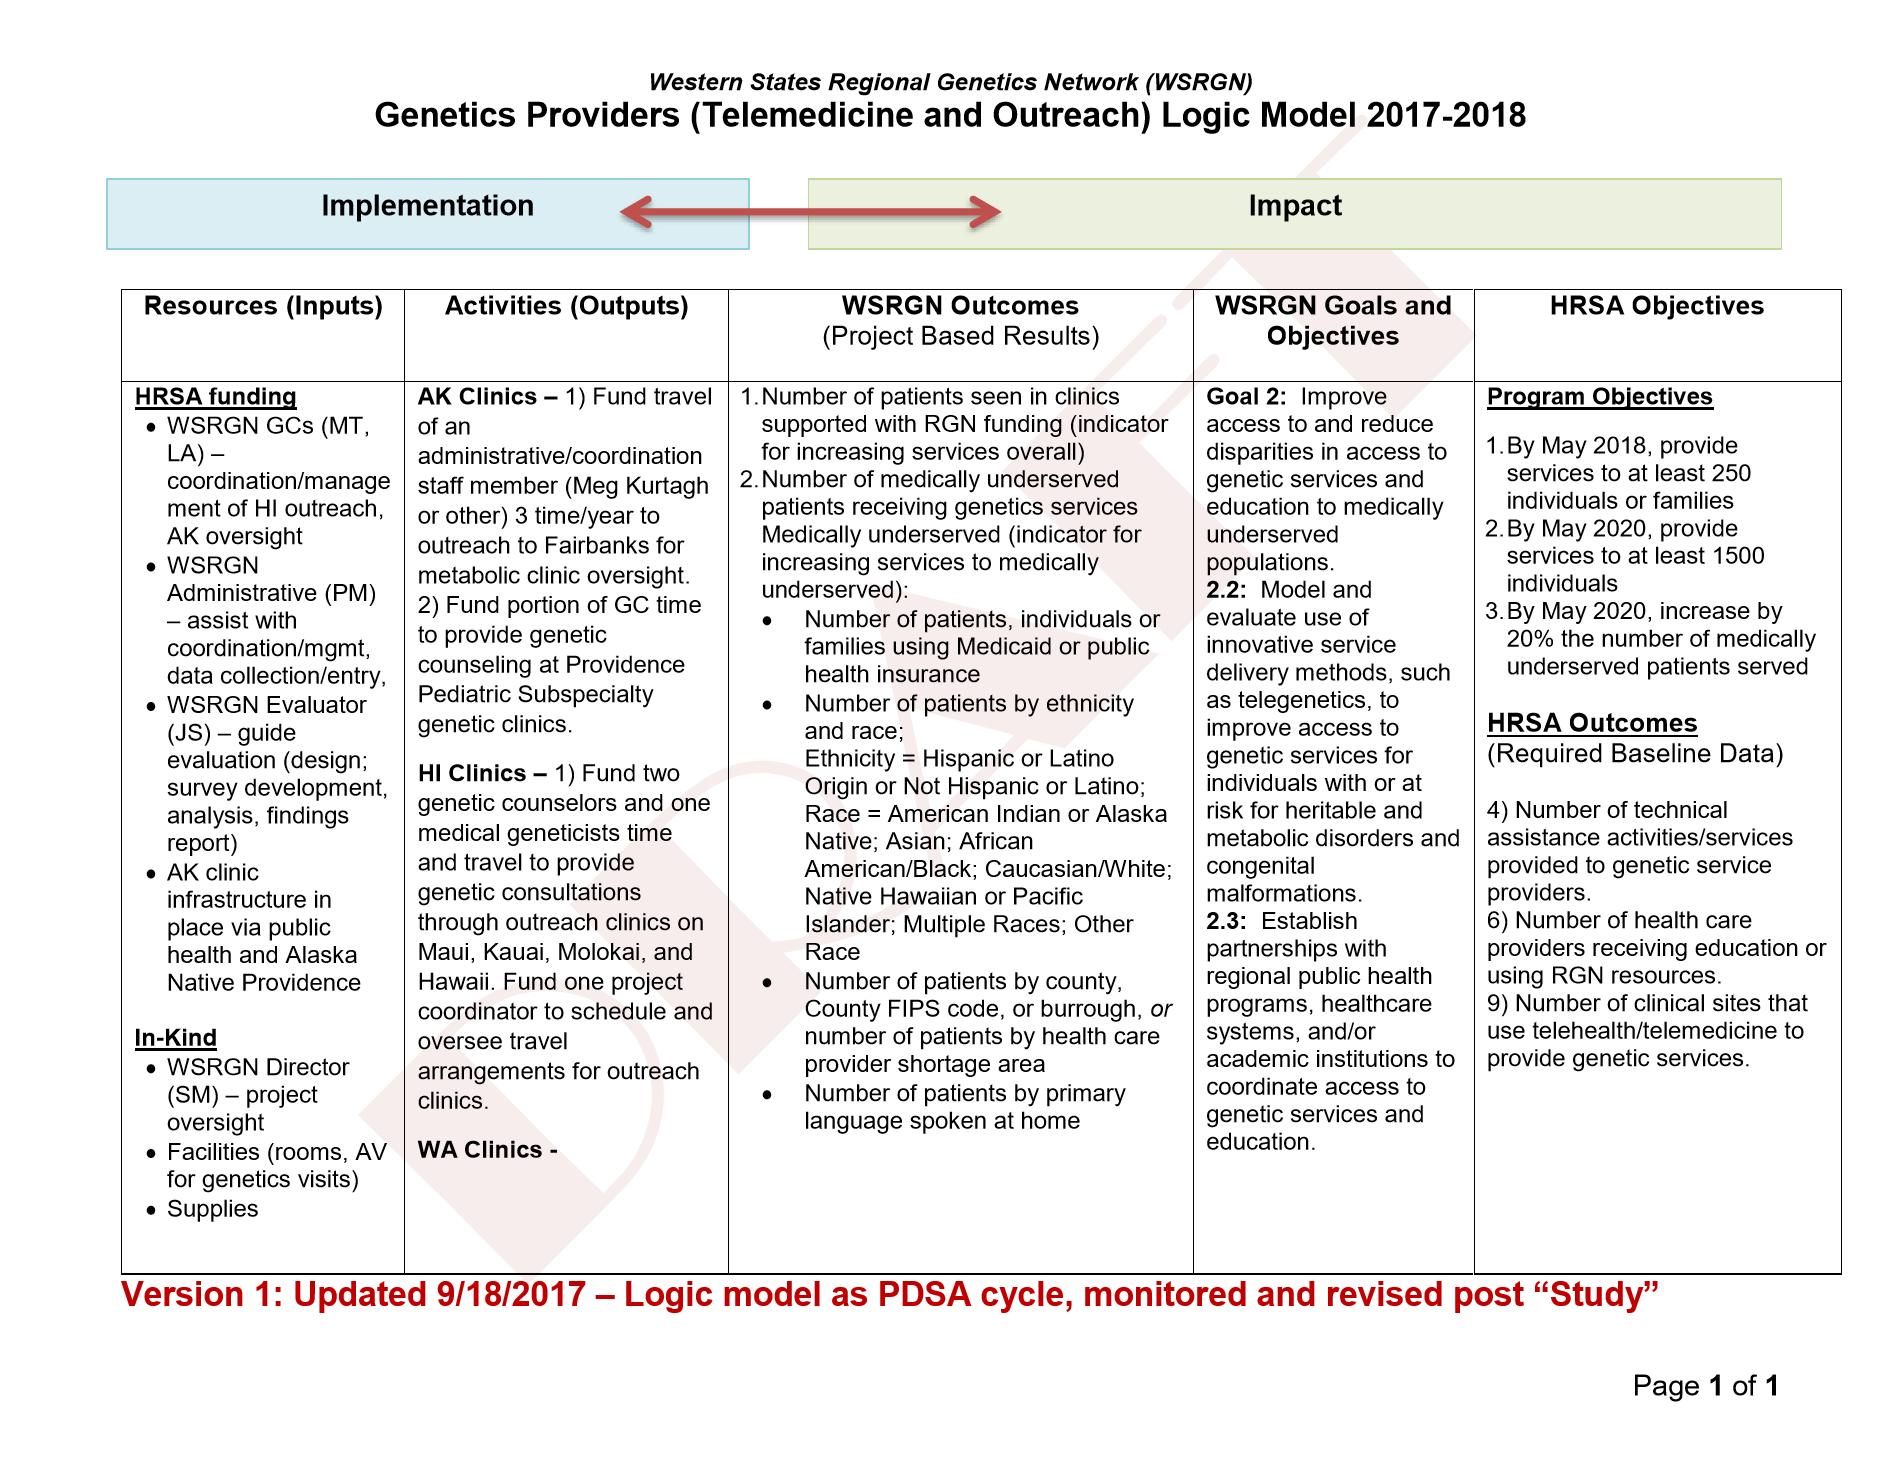 Genetics Outreach Logic Model